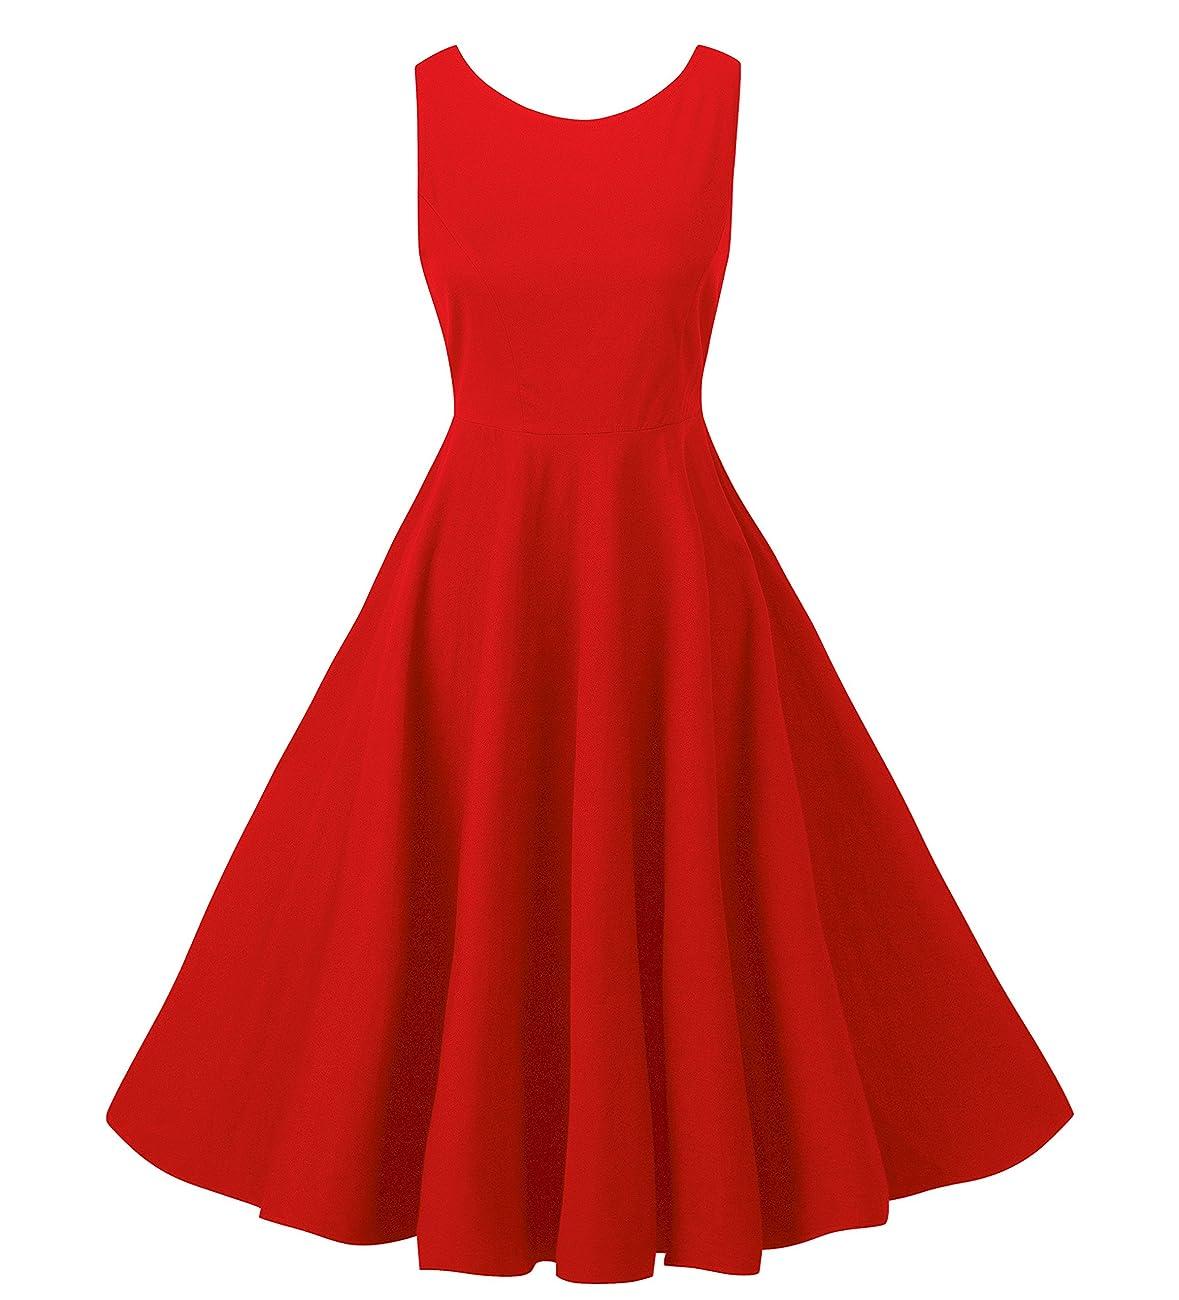 NINEWE Women's Classy Audrey Hepburn 1950s Vintage Rockabilly Swing Dress 0